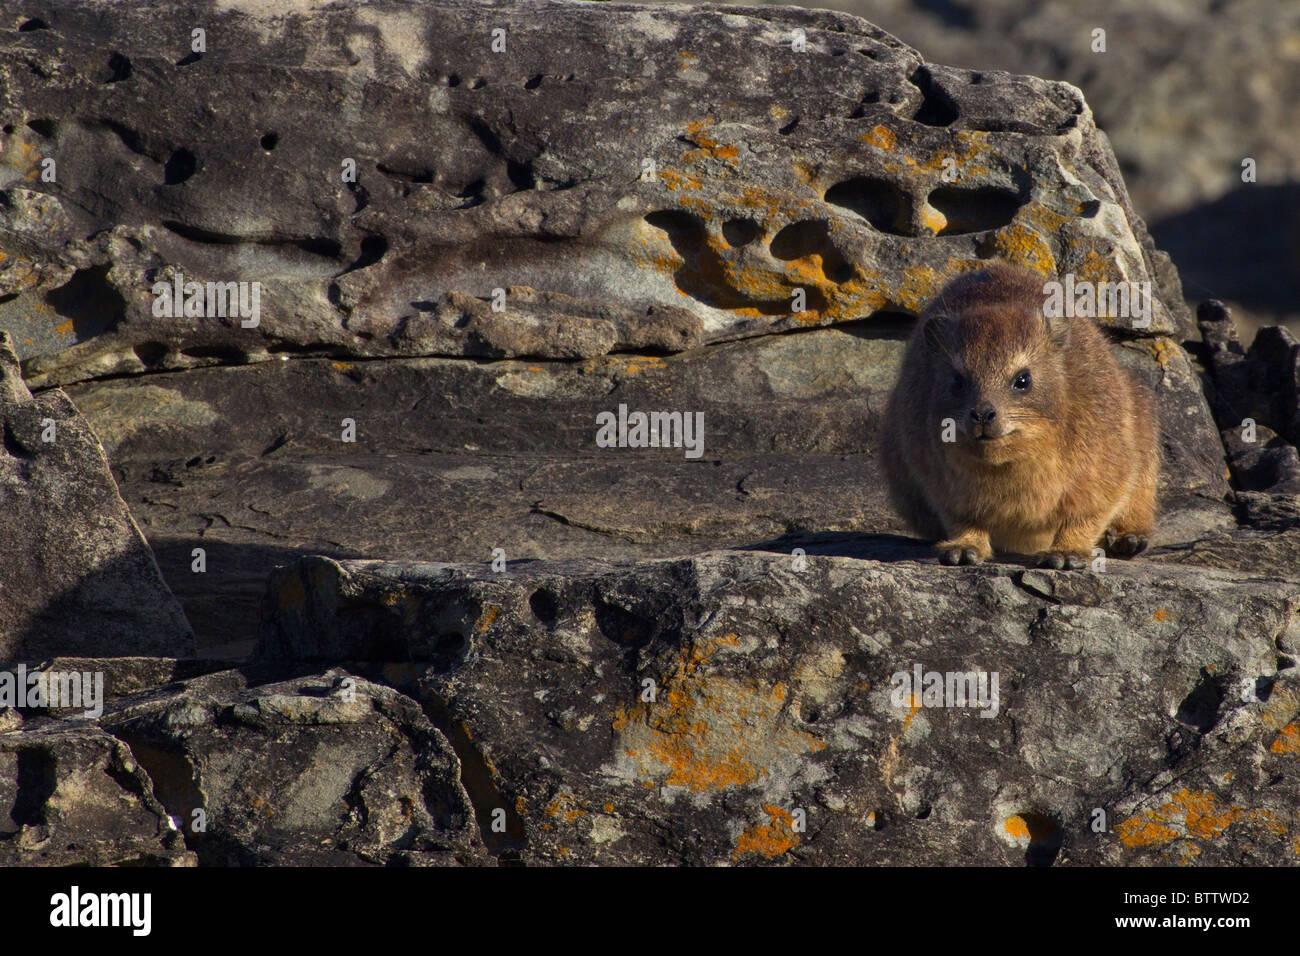 Cape Hyrax on Lichen-covered Rocks, Tsitsikamma National Park, South Africa - Stock Image